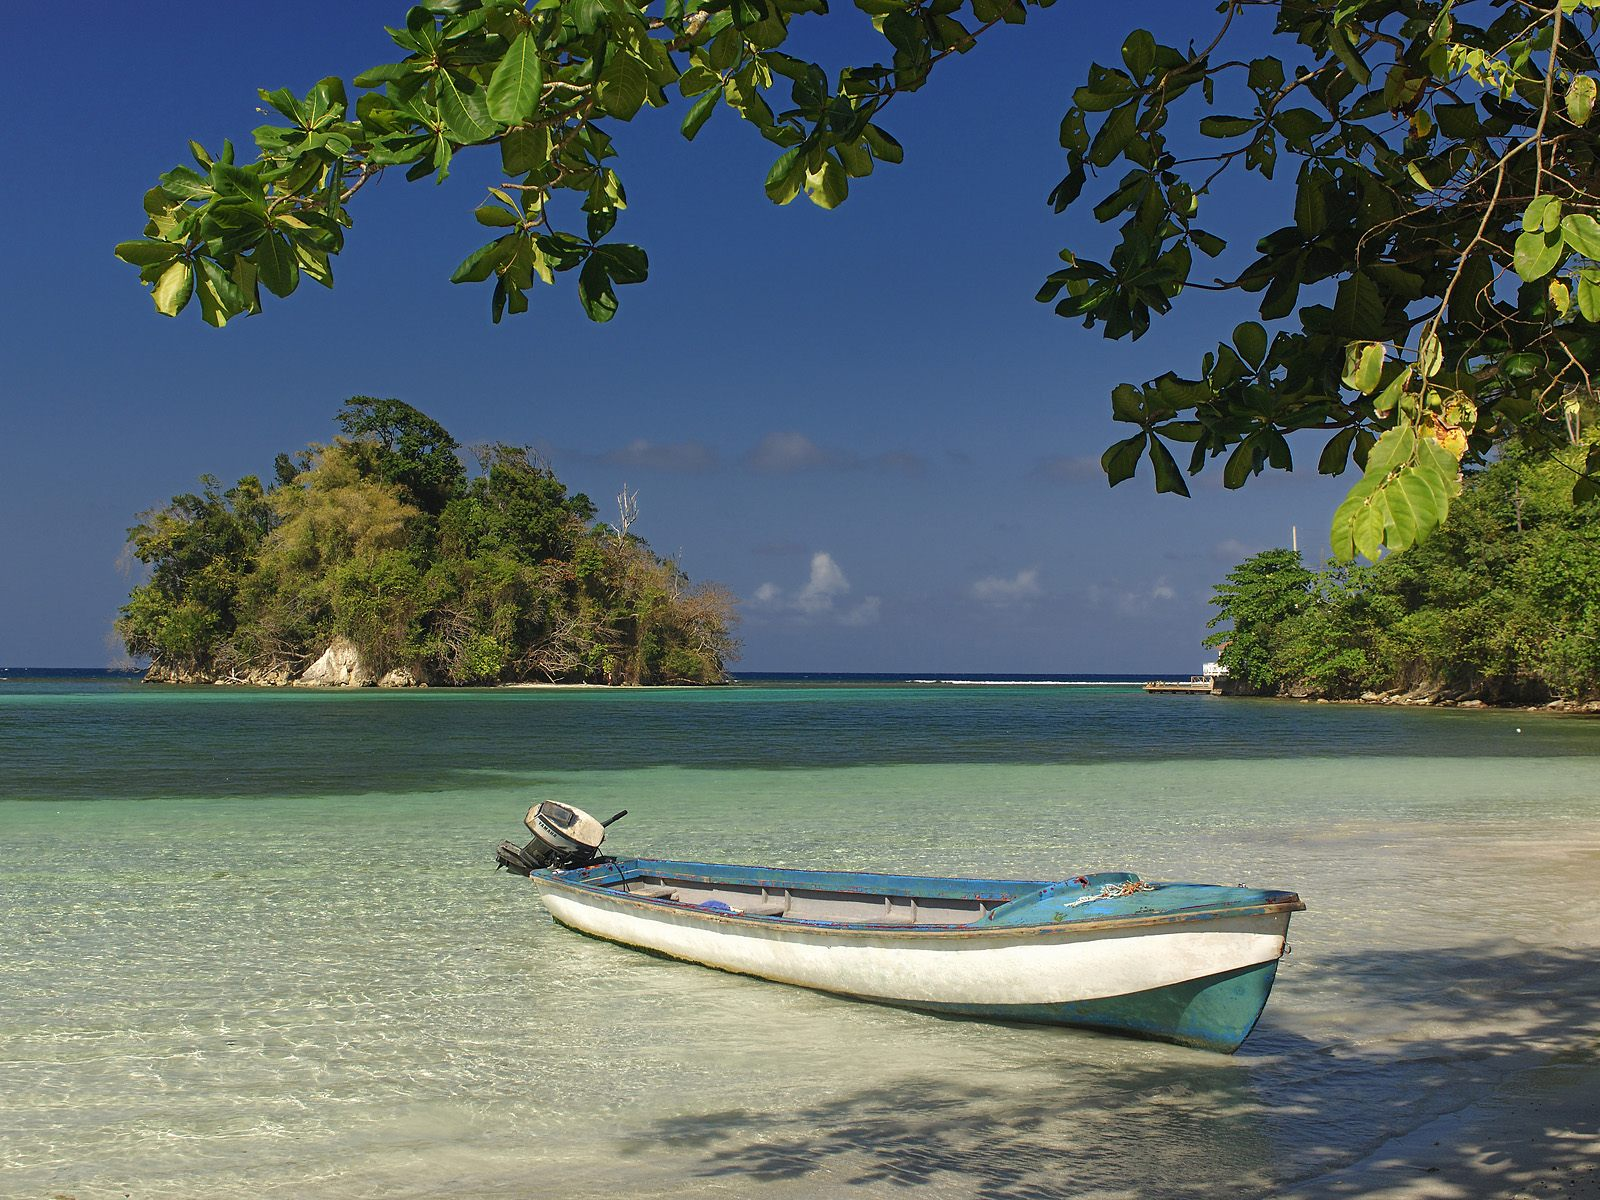 Beach in jamaica pictures Mahogany Beach Ocho Rios JAMAICA My Way!